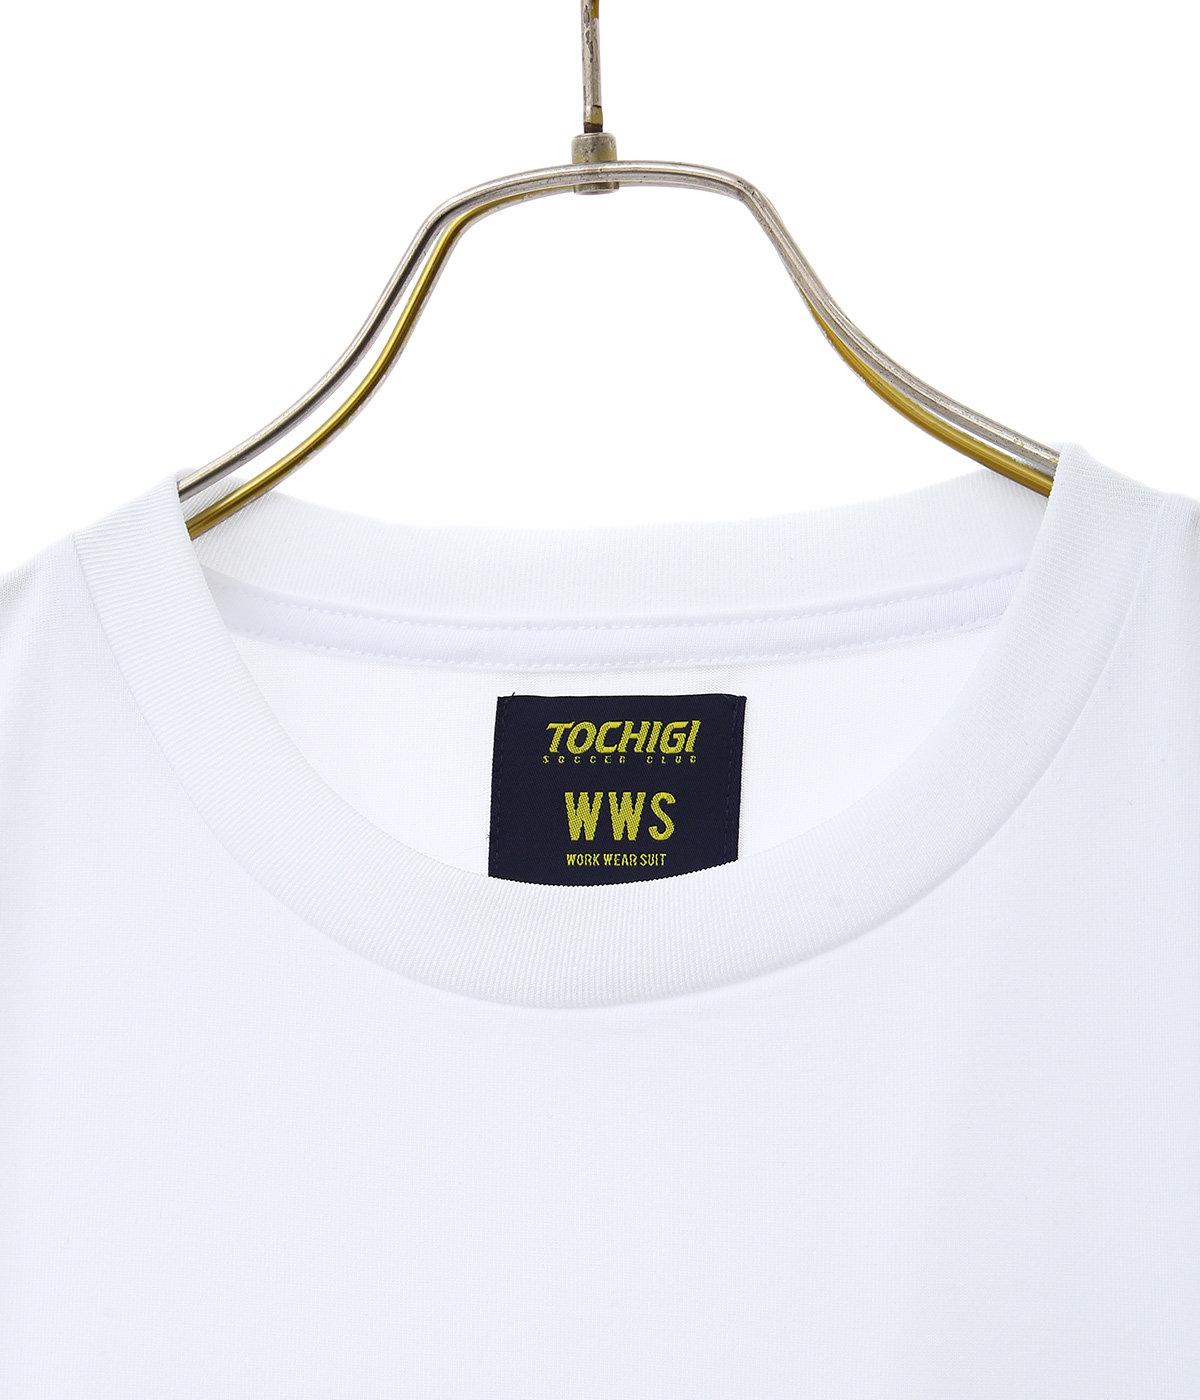 WWS×TOCHIGI SC×ARKnets オフィシャル Tシャツ